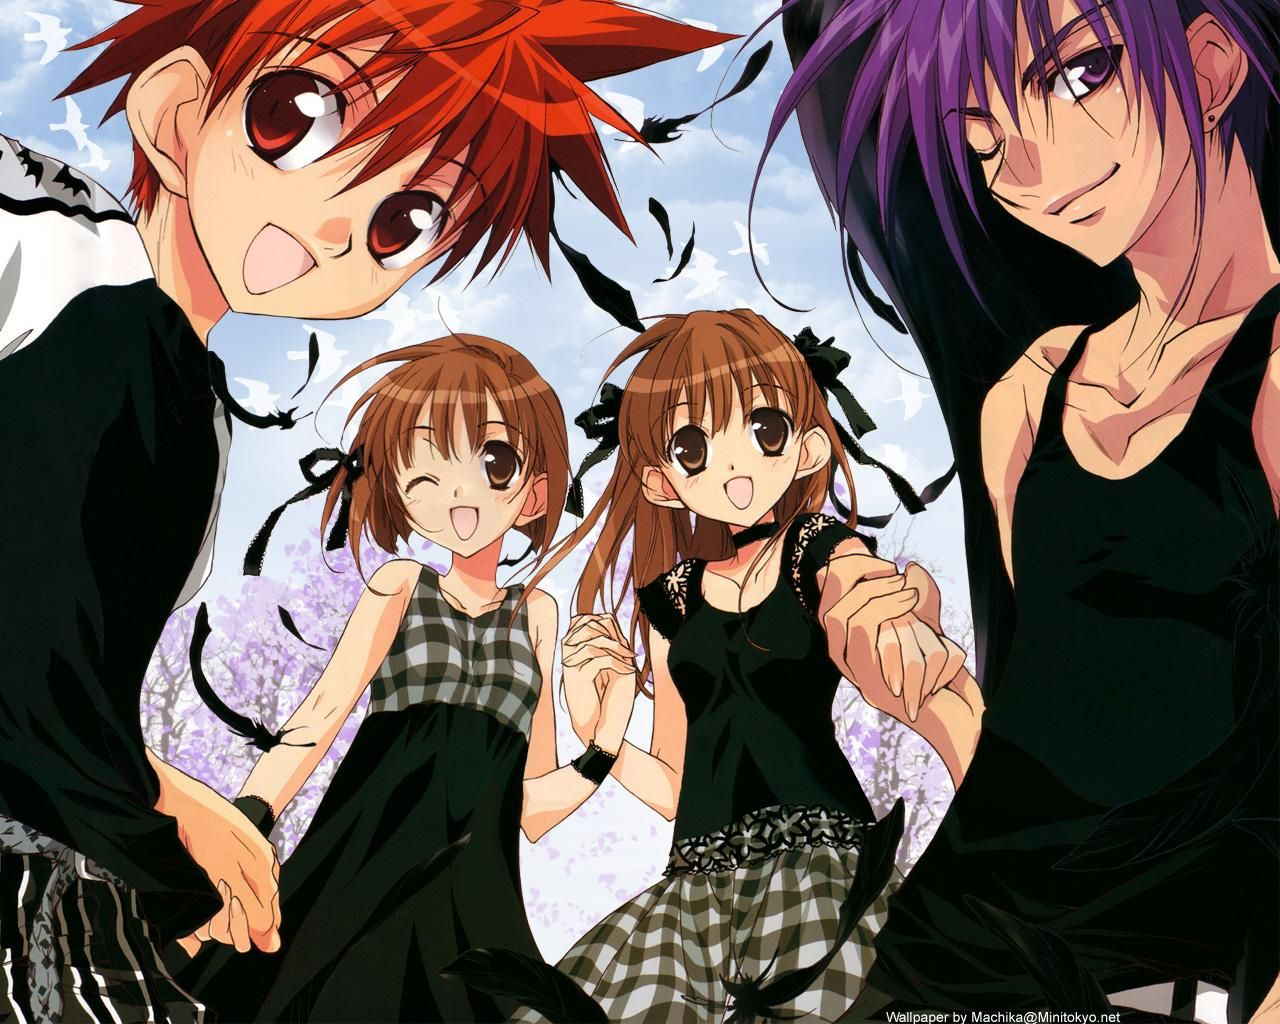 Daisuke riku dark risa - Dark anime couples ...